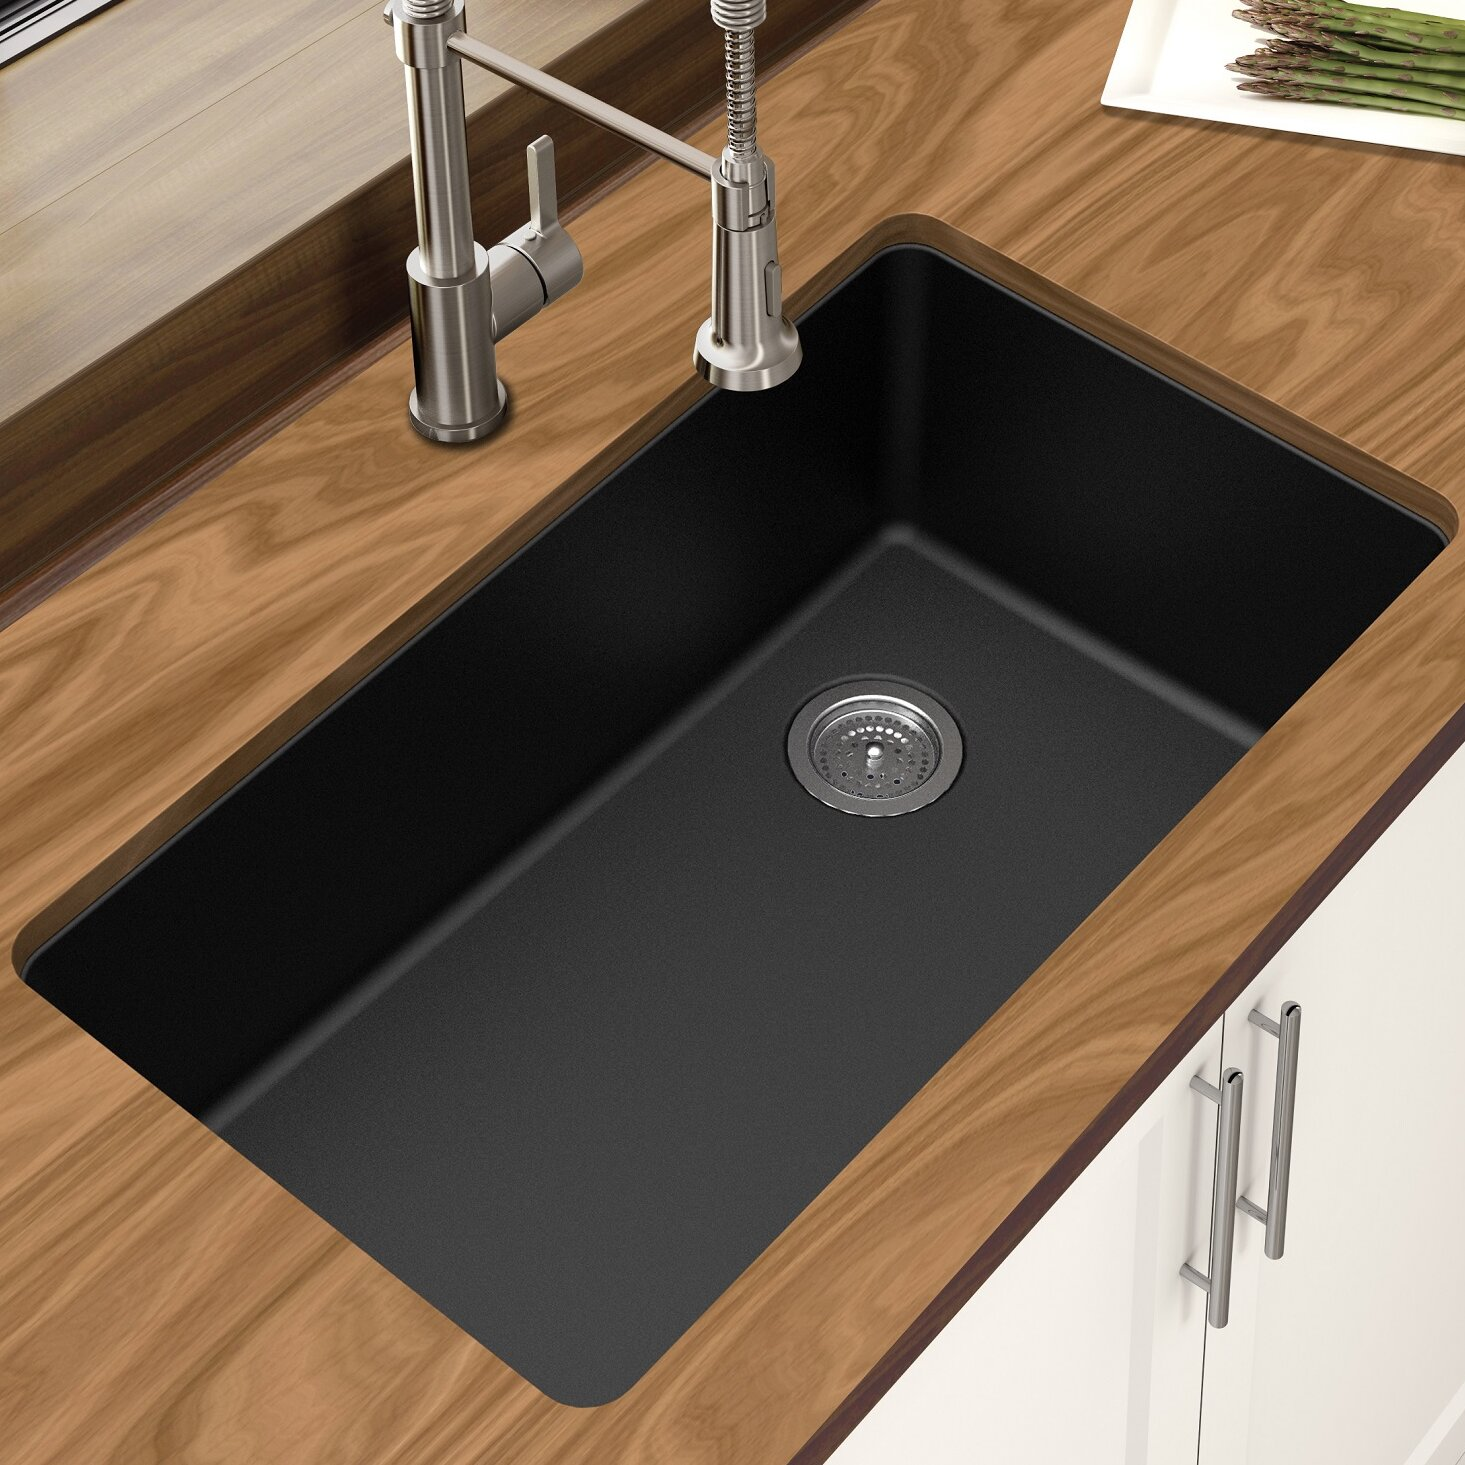 Winpro Granite Quartz 33 L X 18 75 W Single Bowl Undermount Kitchen Sink Reviews Wayfair,Best Bedroom Air Purifier For Mold